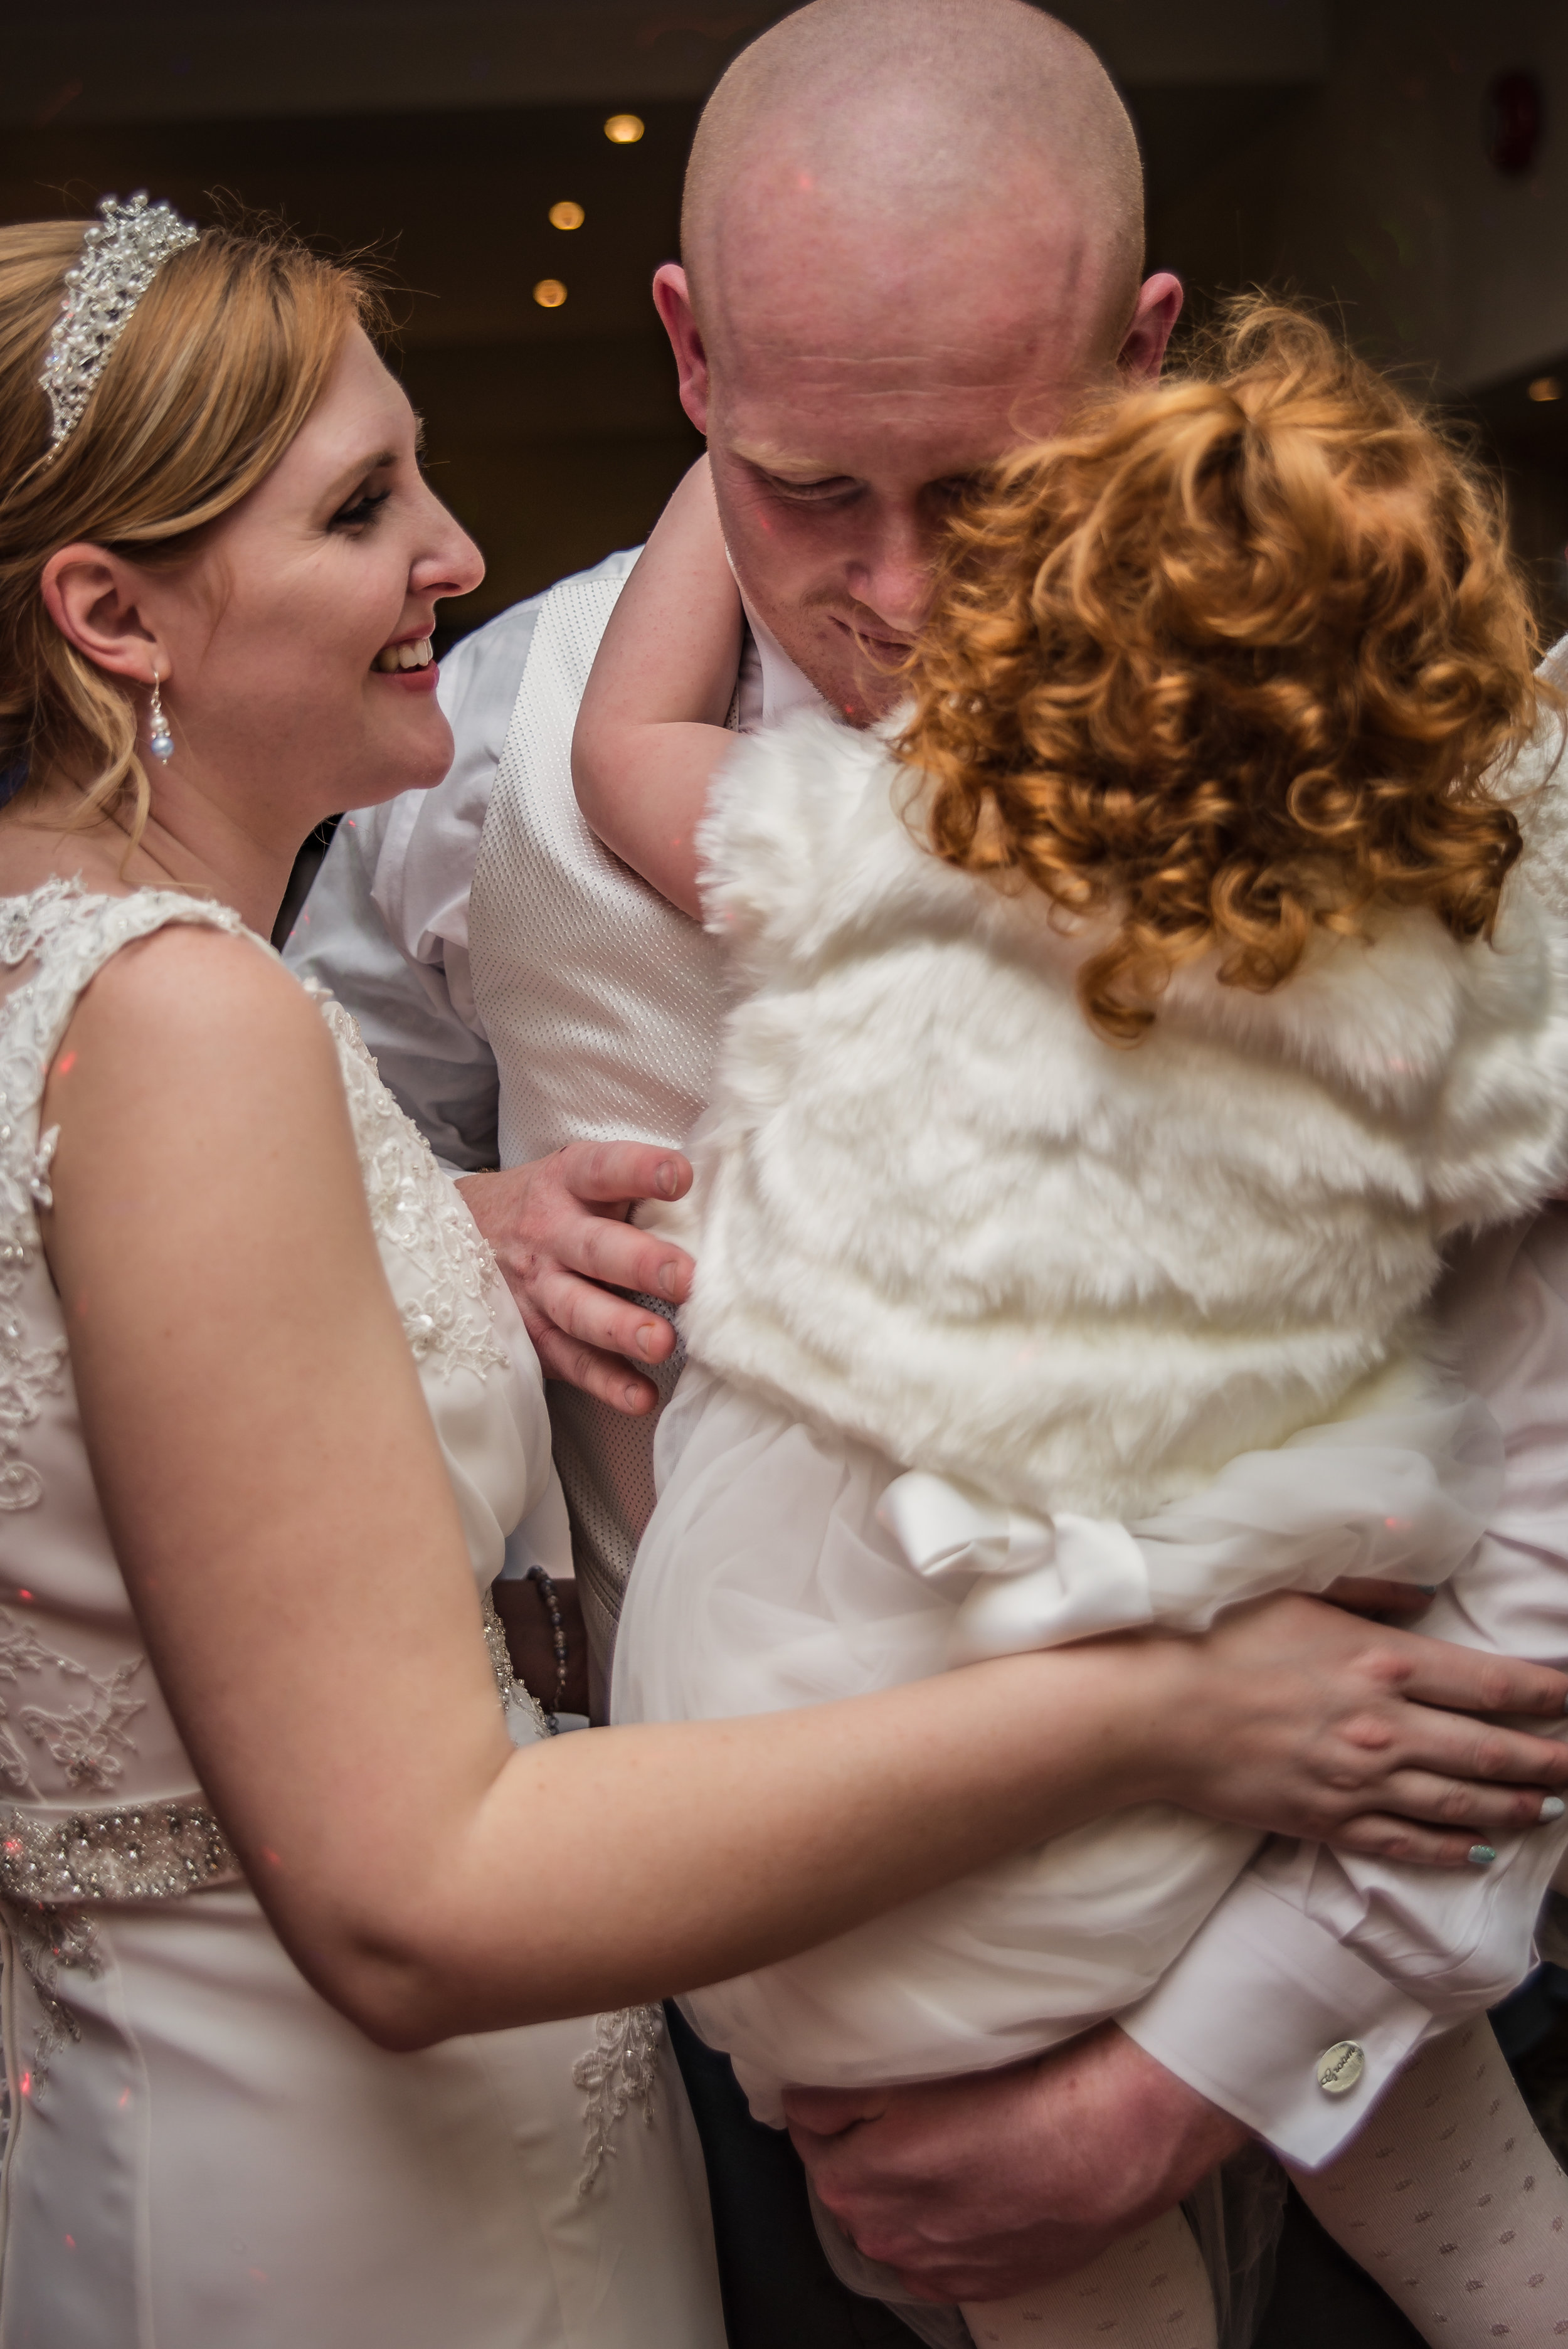 wedding photography family candid photo